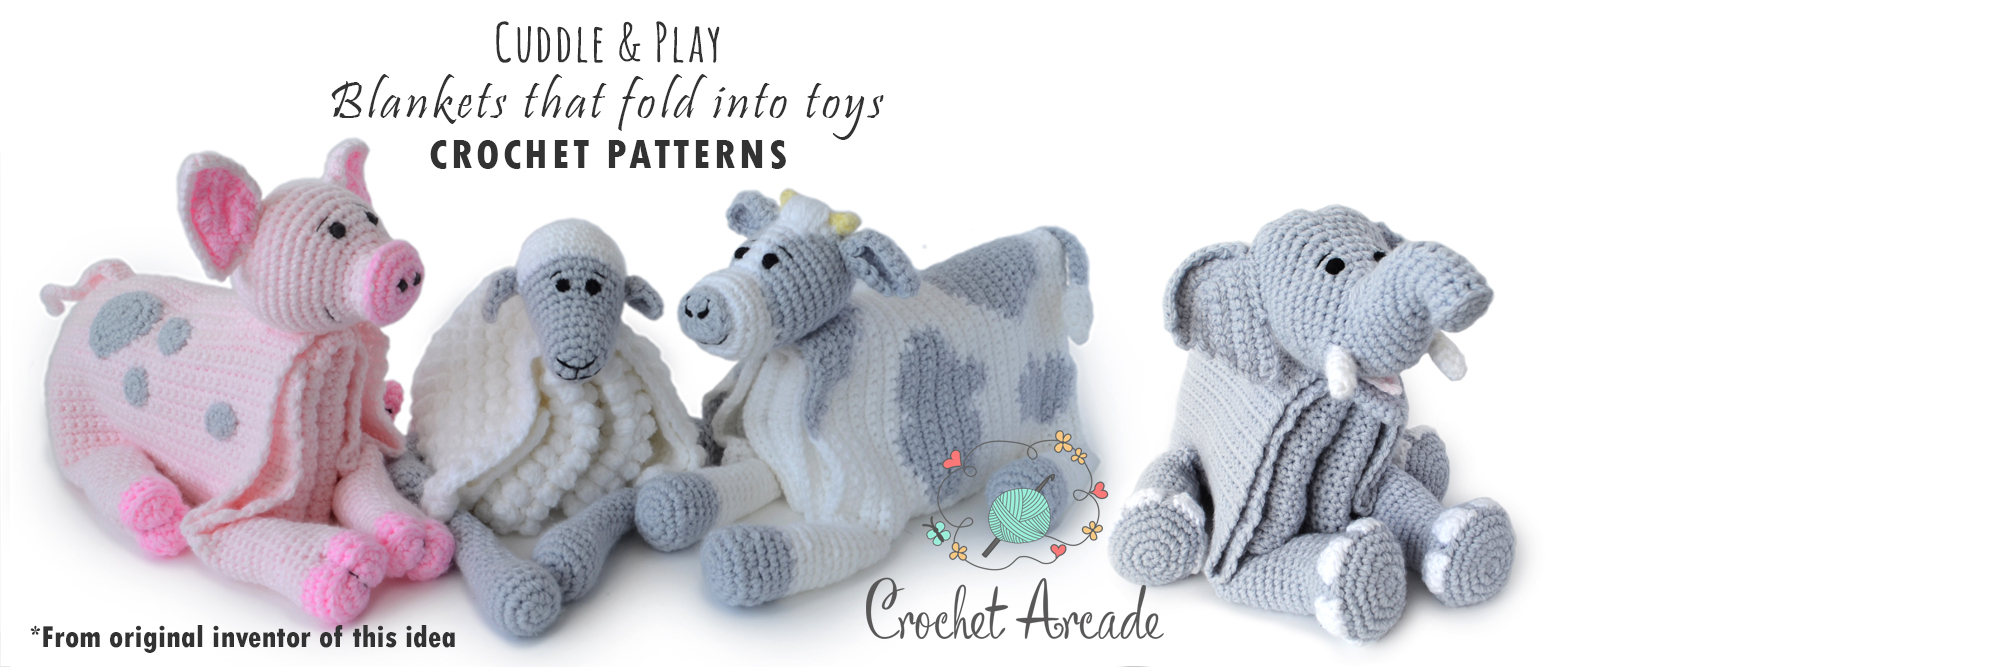 Free Crochet Patterns Archives | Crochet Arcade